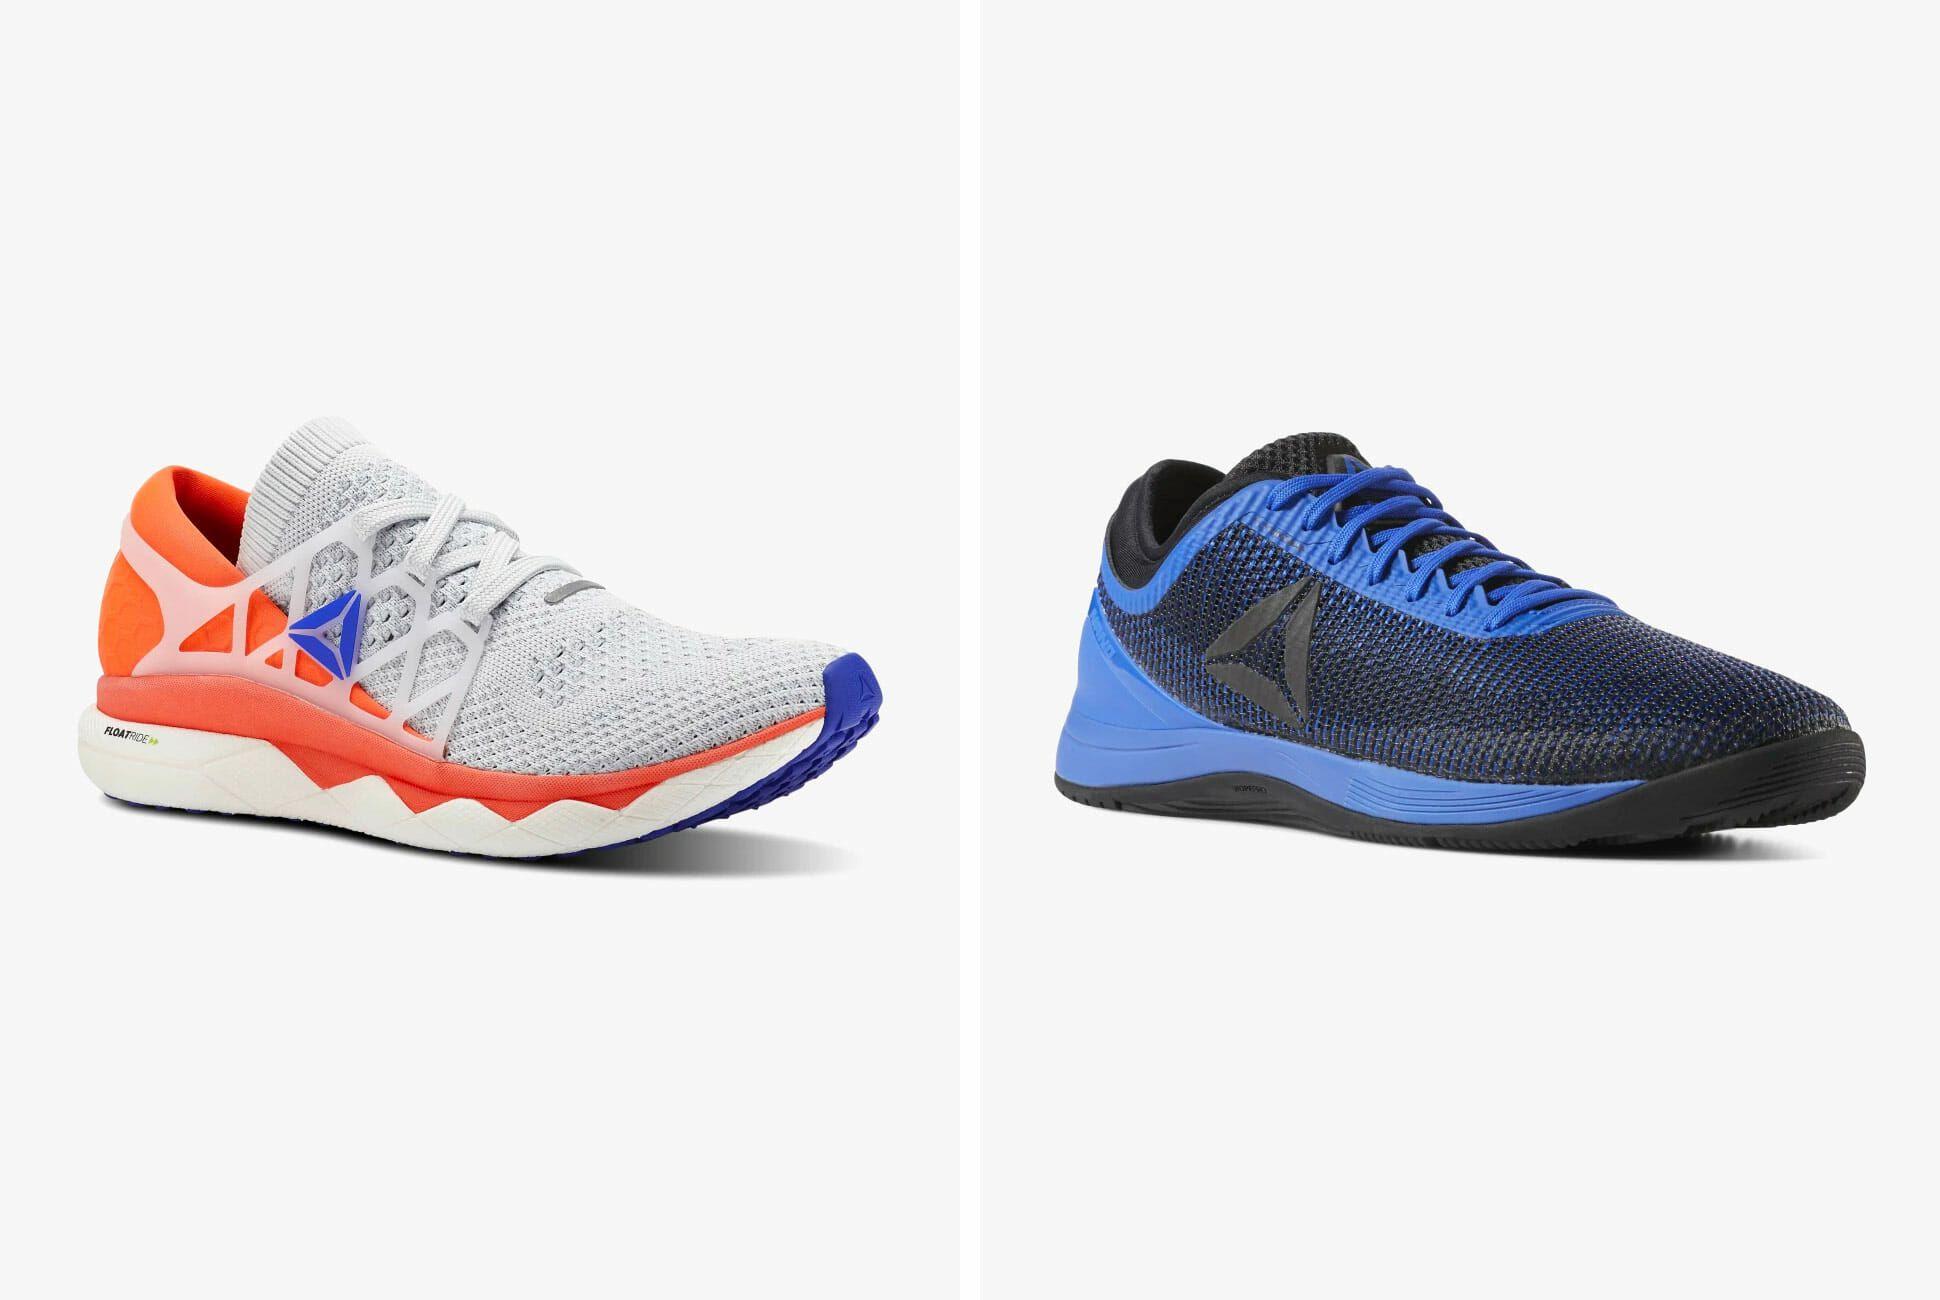 Reebok's Best-Selling CrossFit Shoes